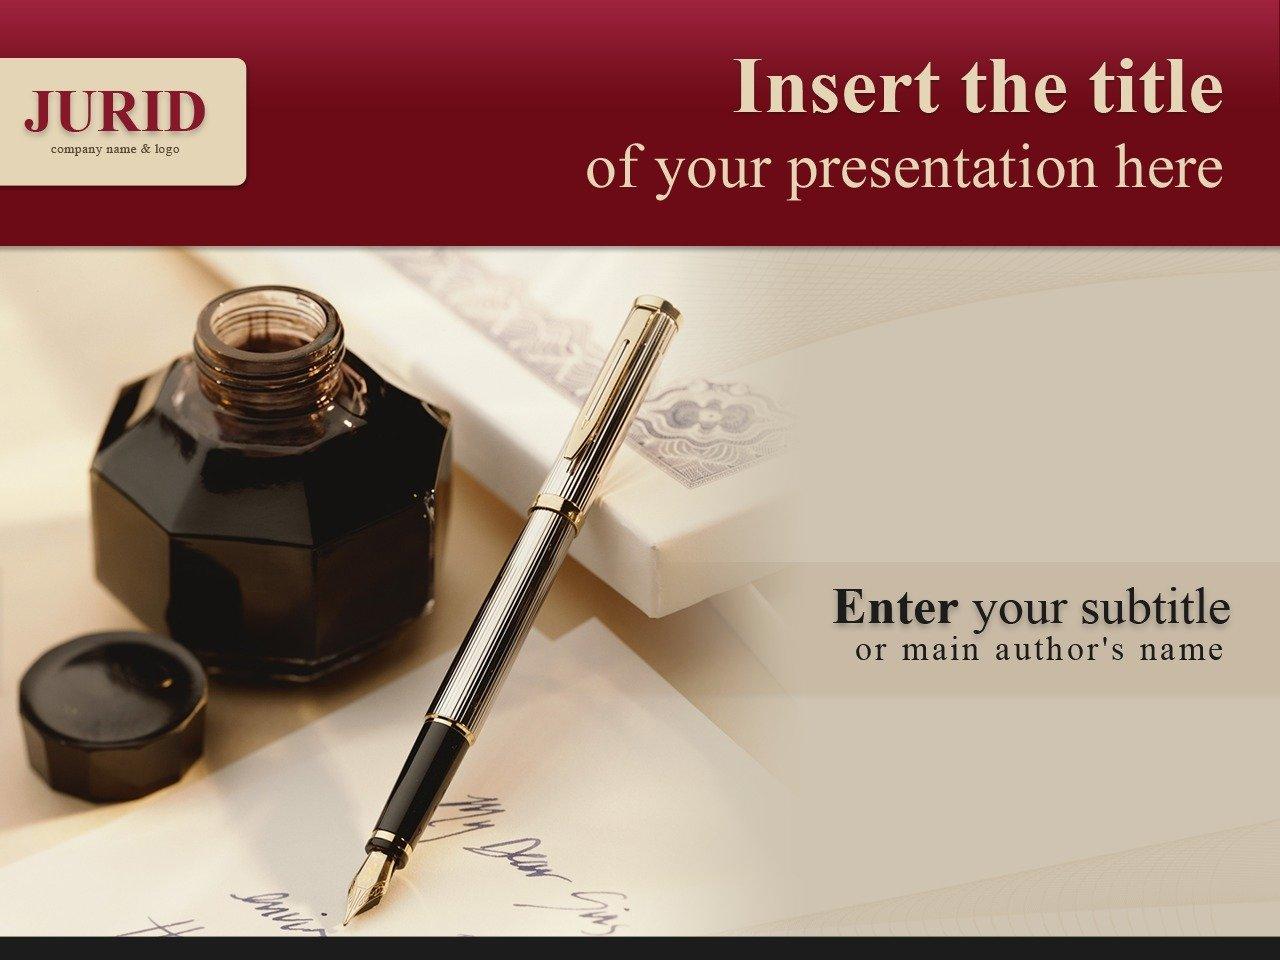 PowerPoint шаблон №25035 на тему юрист - скриншот